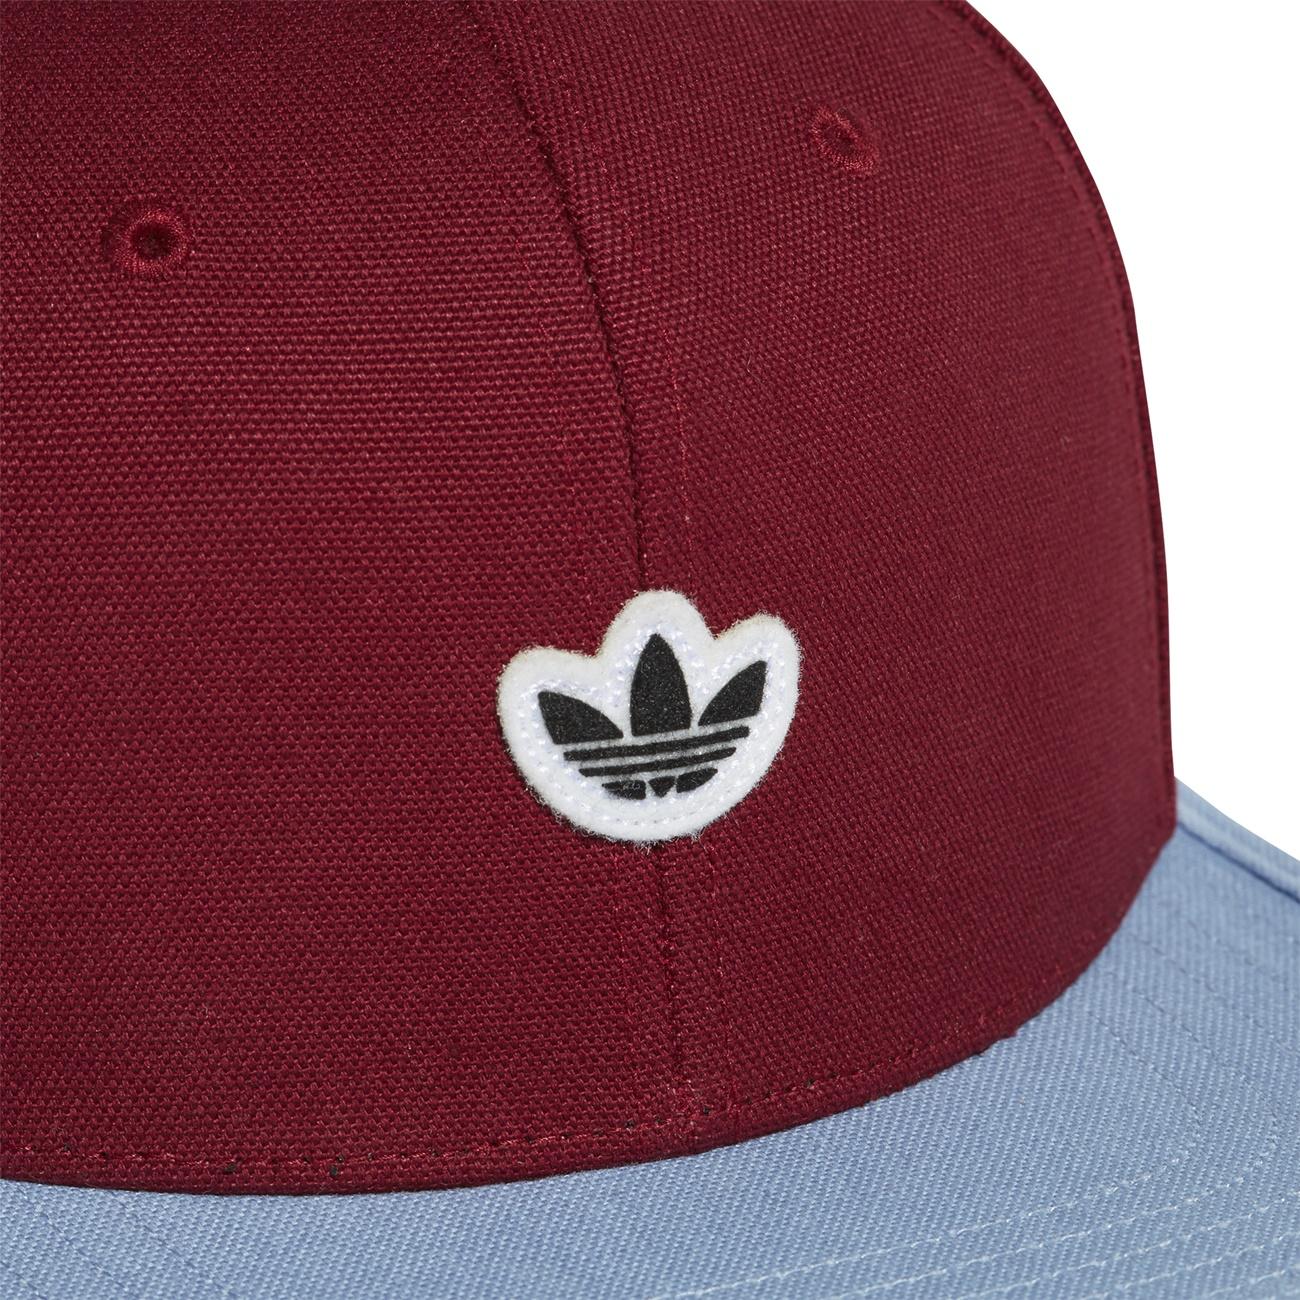 02da3cd3d49d8 ... Adidas Originlas 6 Panels Unstructured Cap